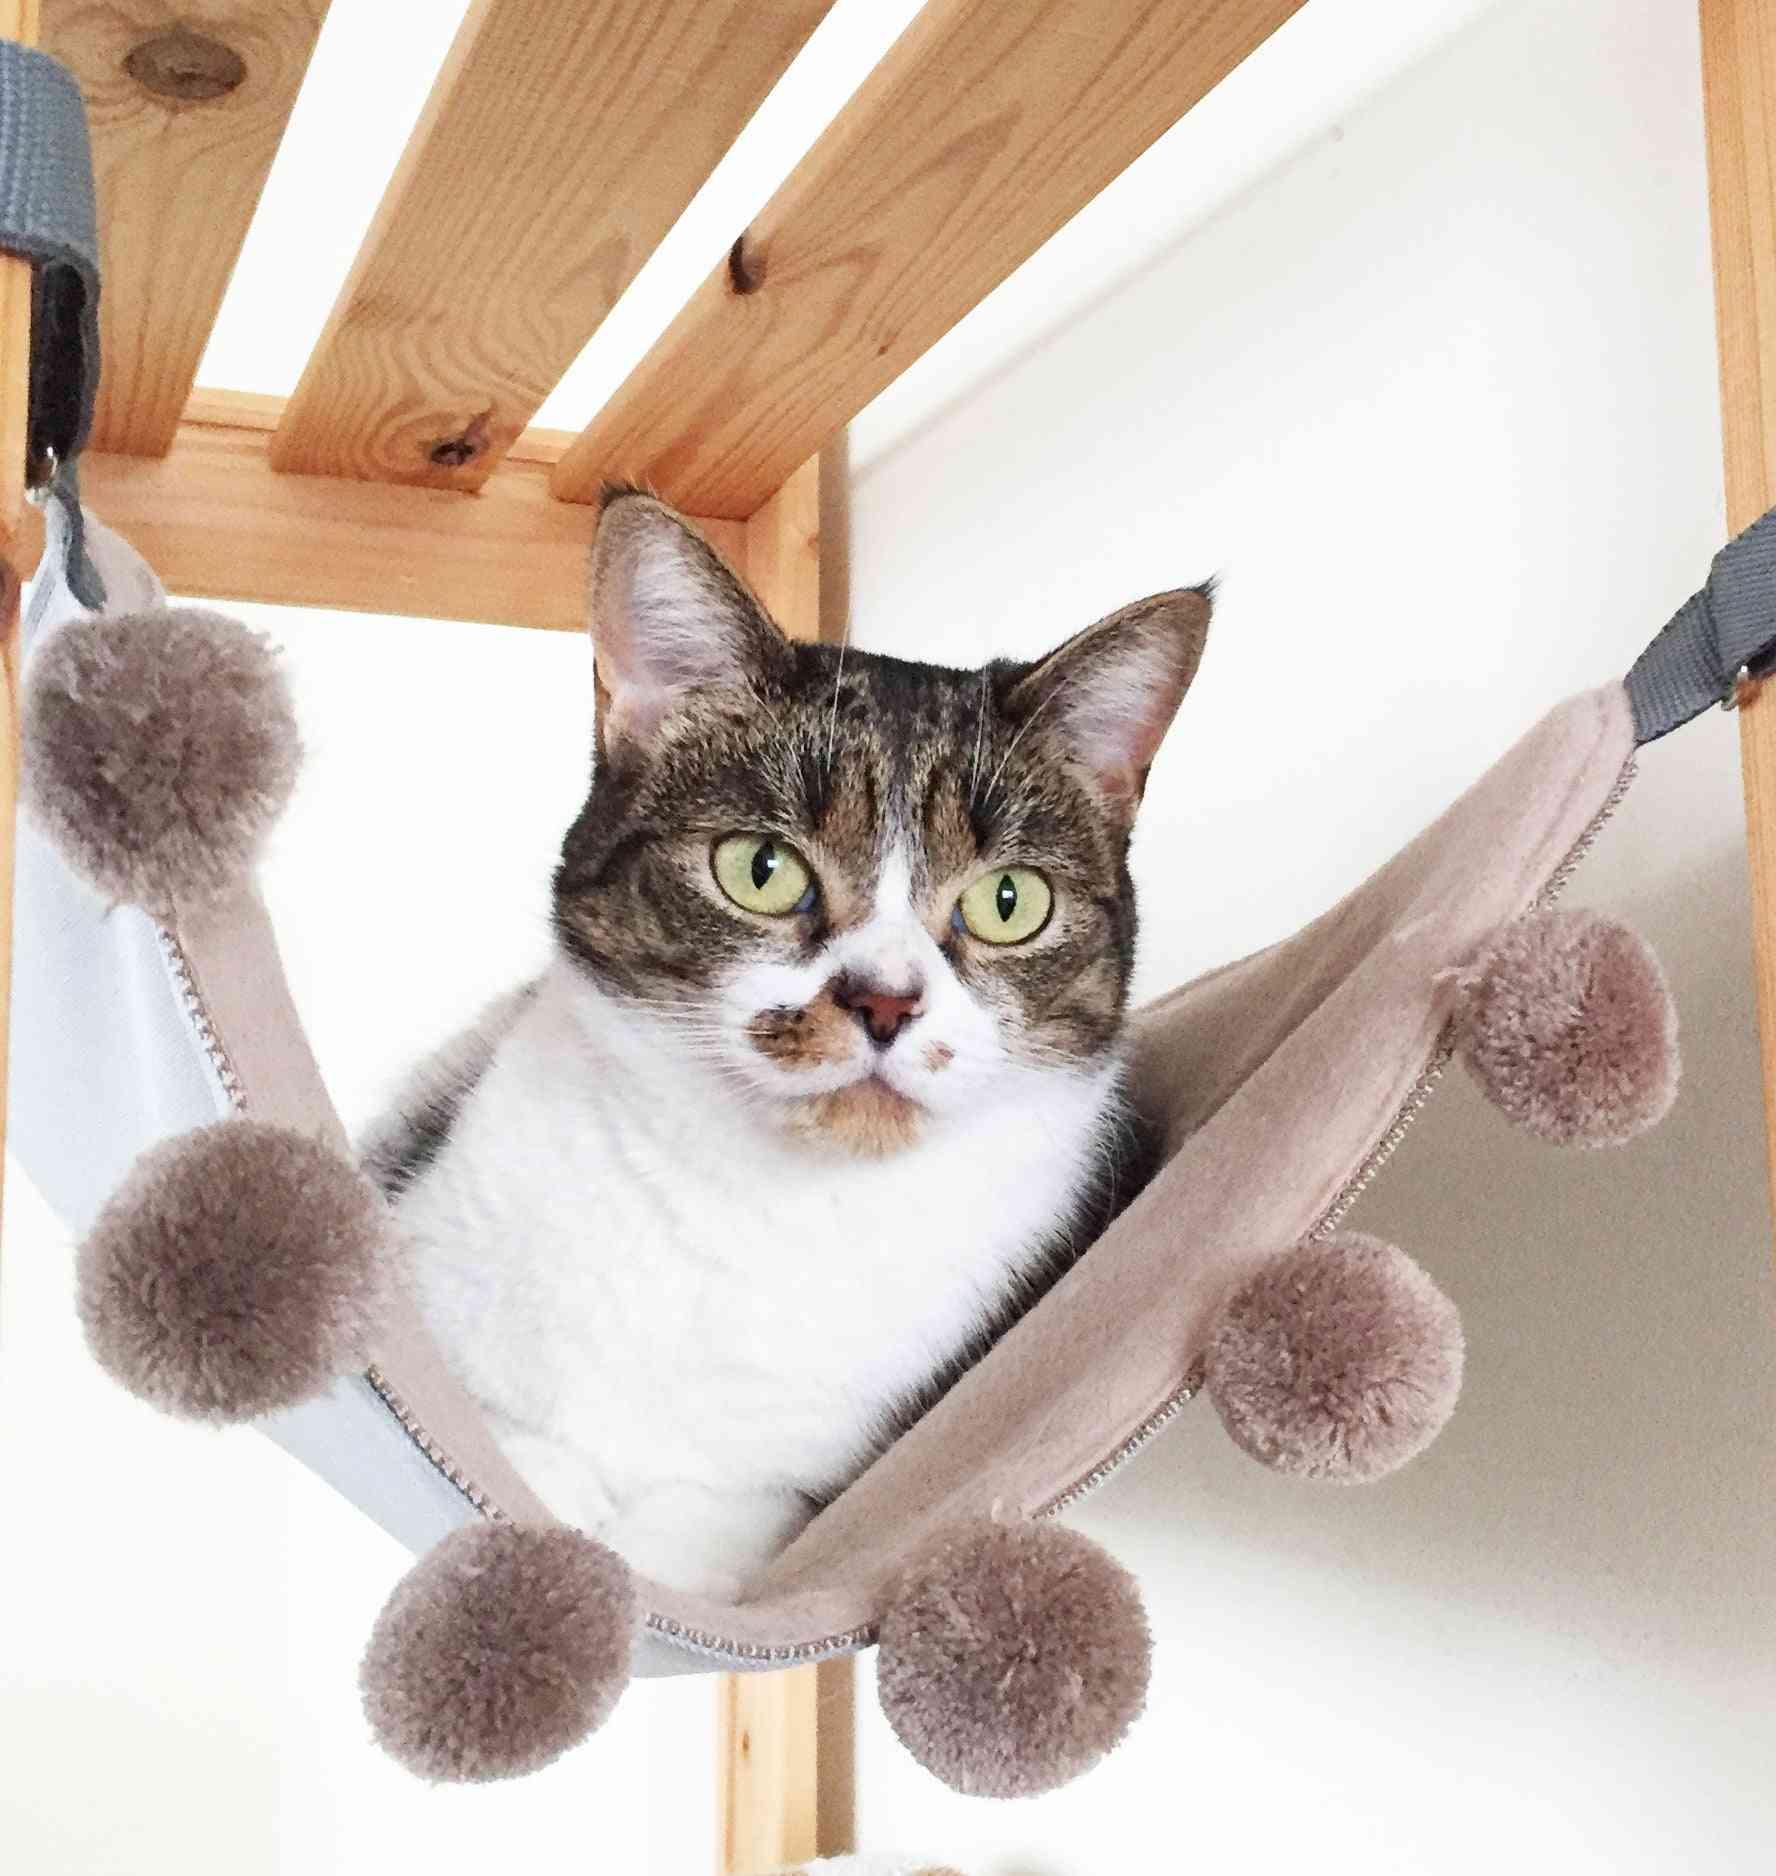 Saveplace® Hanging Mat/hammock For Storage & Pets With Big Pom-poms